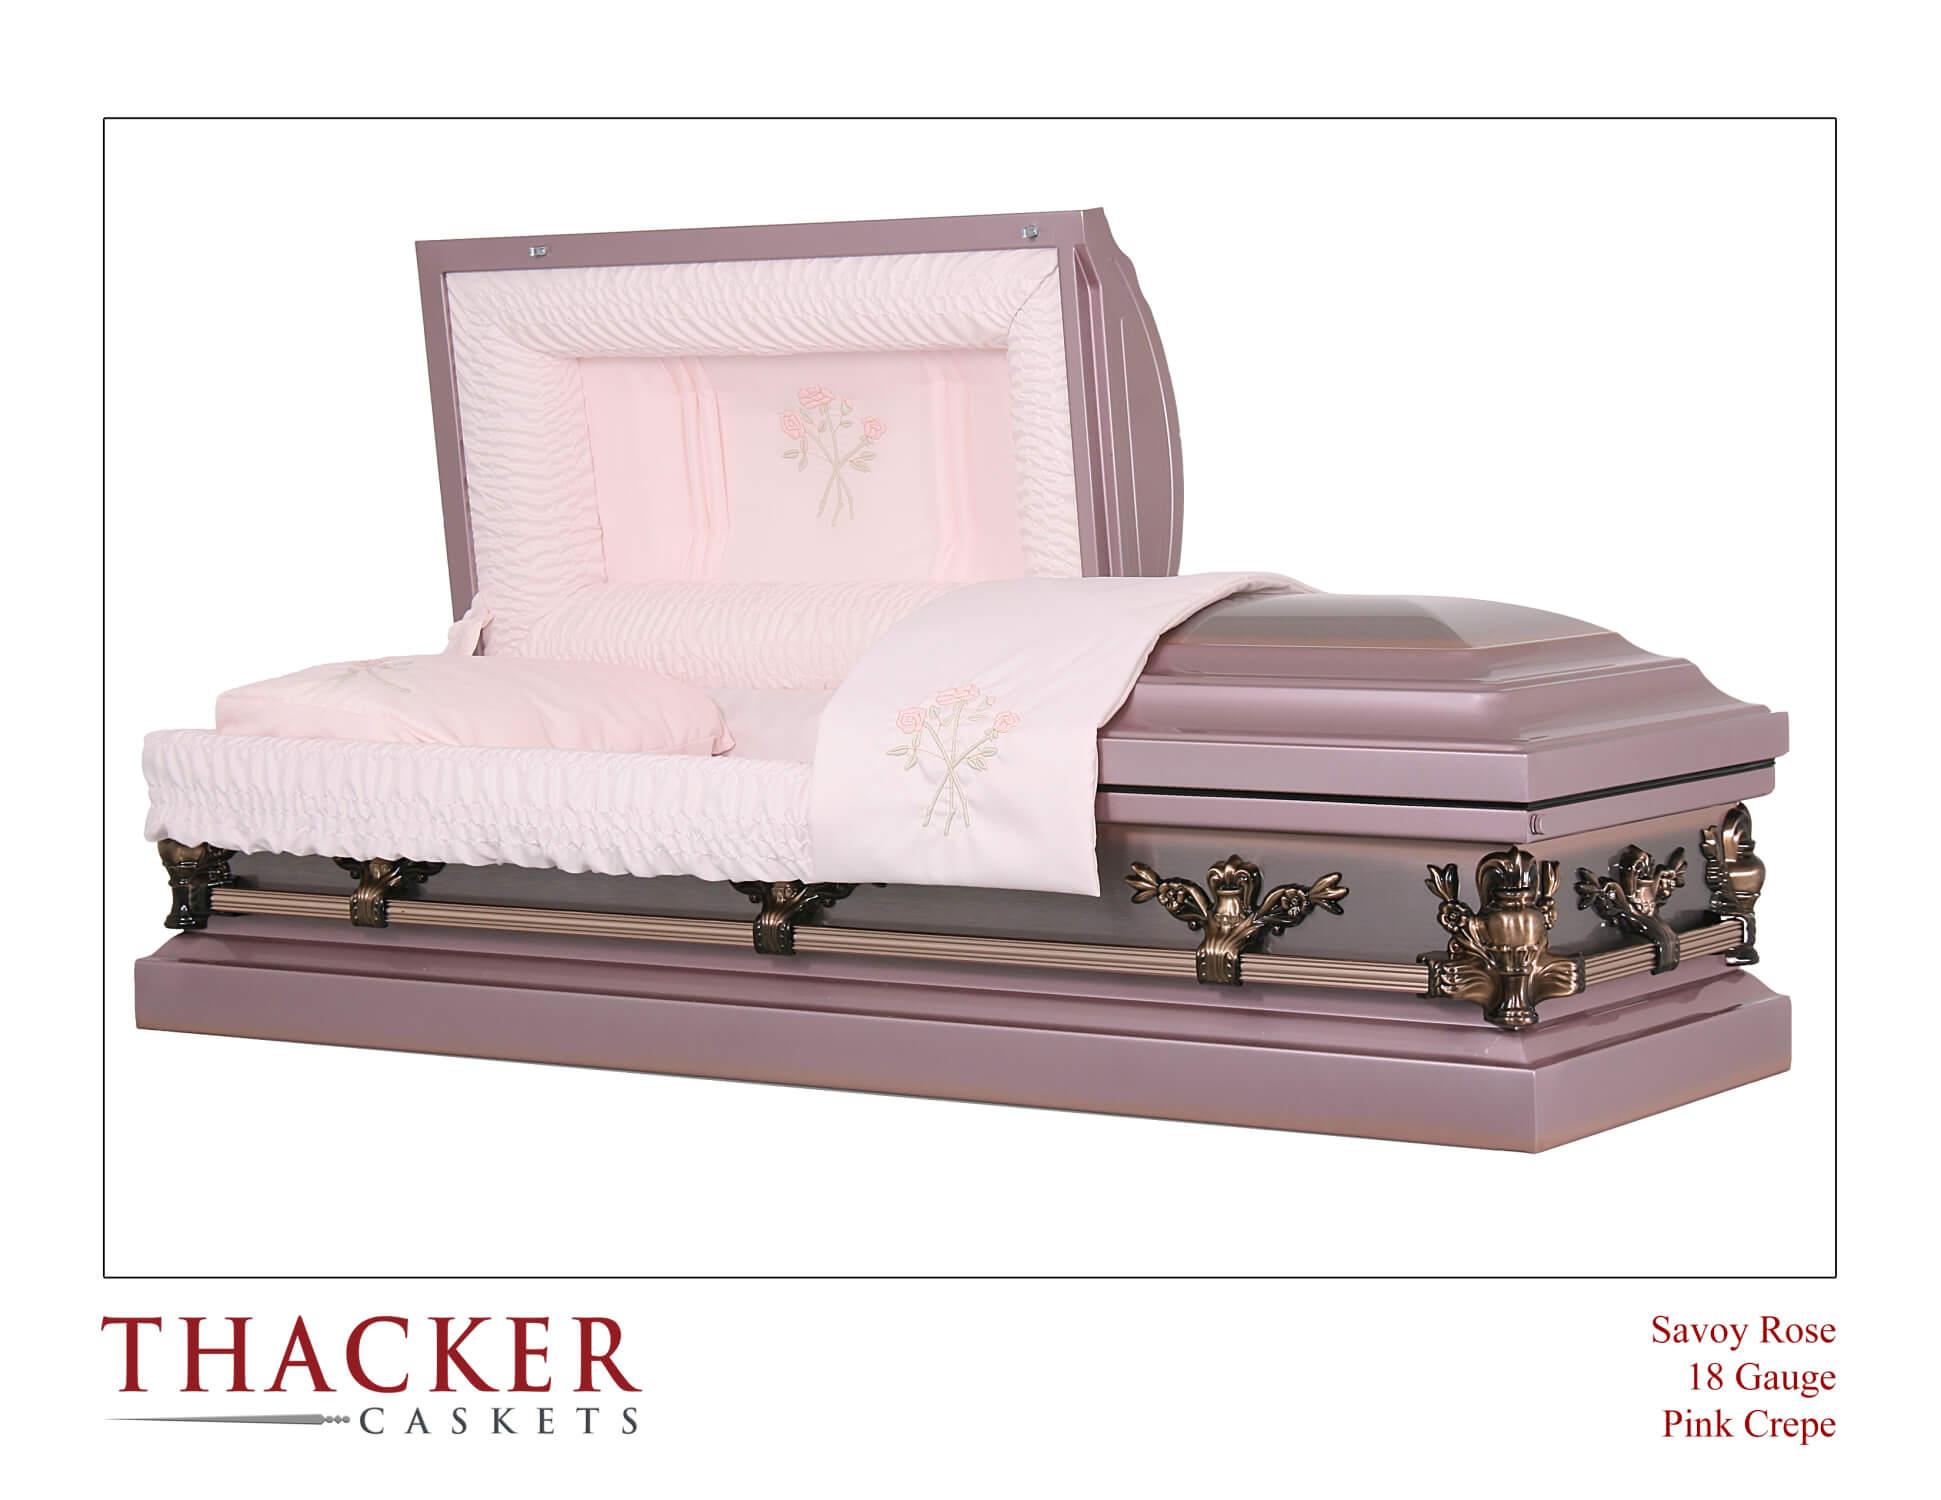 18 Gauge Lavender, Pink, Antique Looking Casket For A Lady - $2,595.00